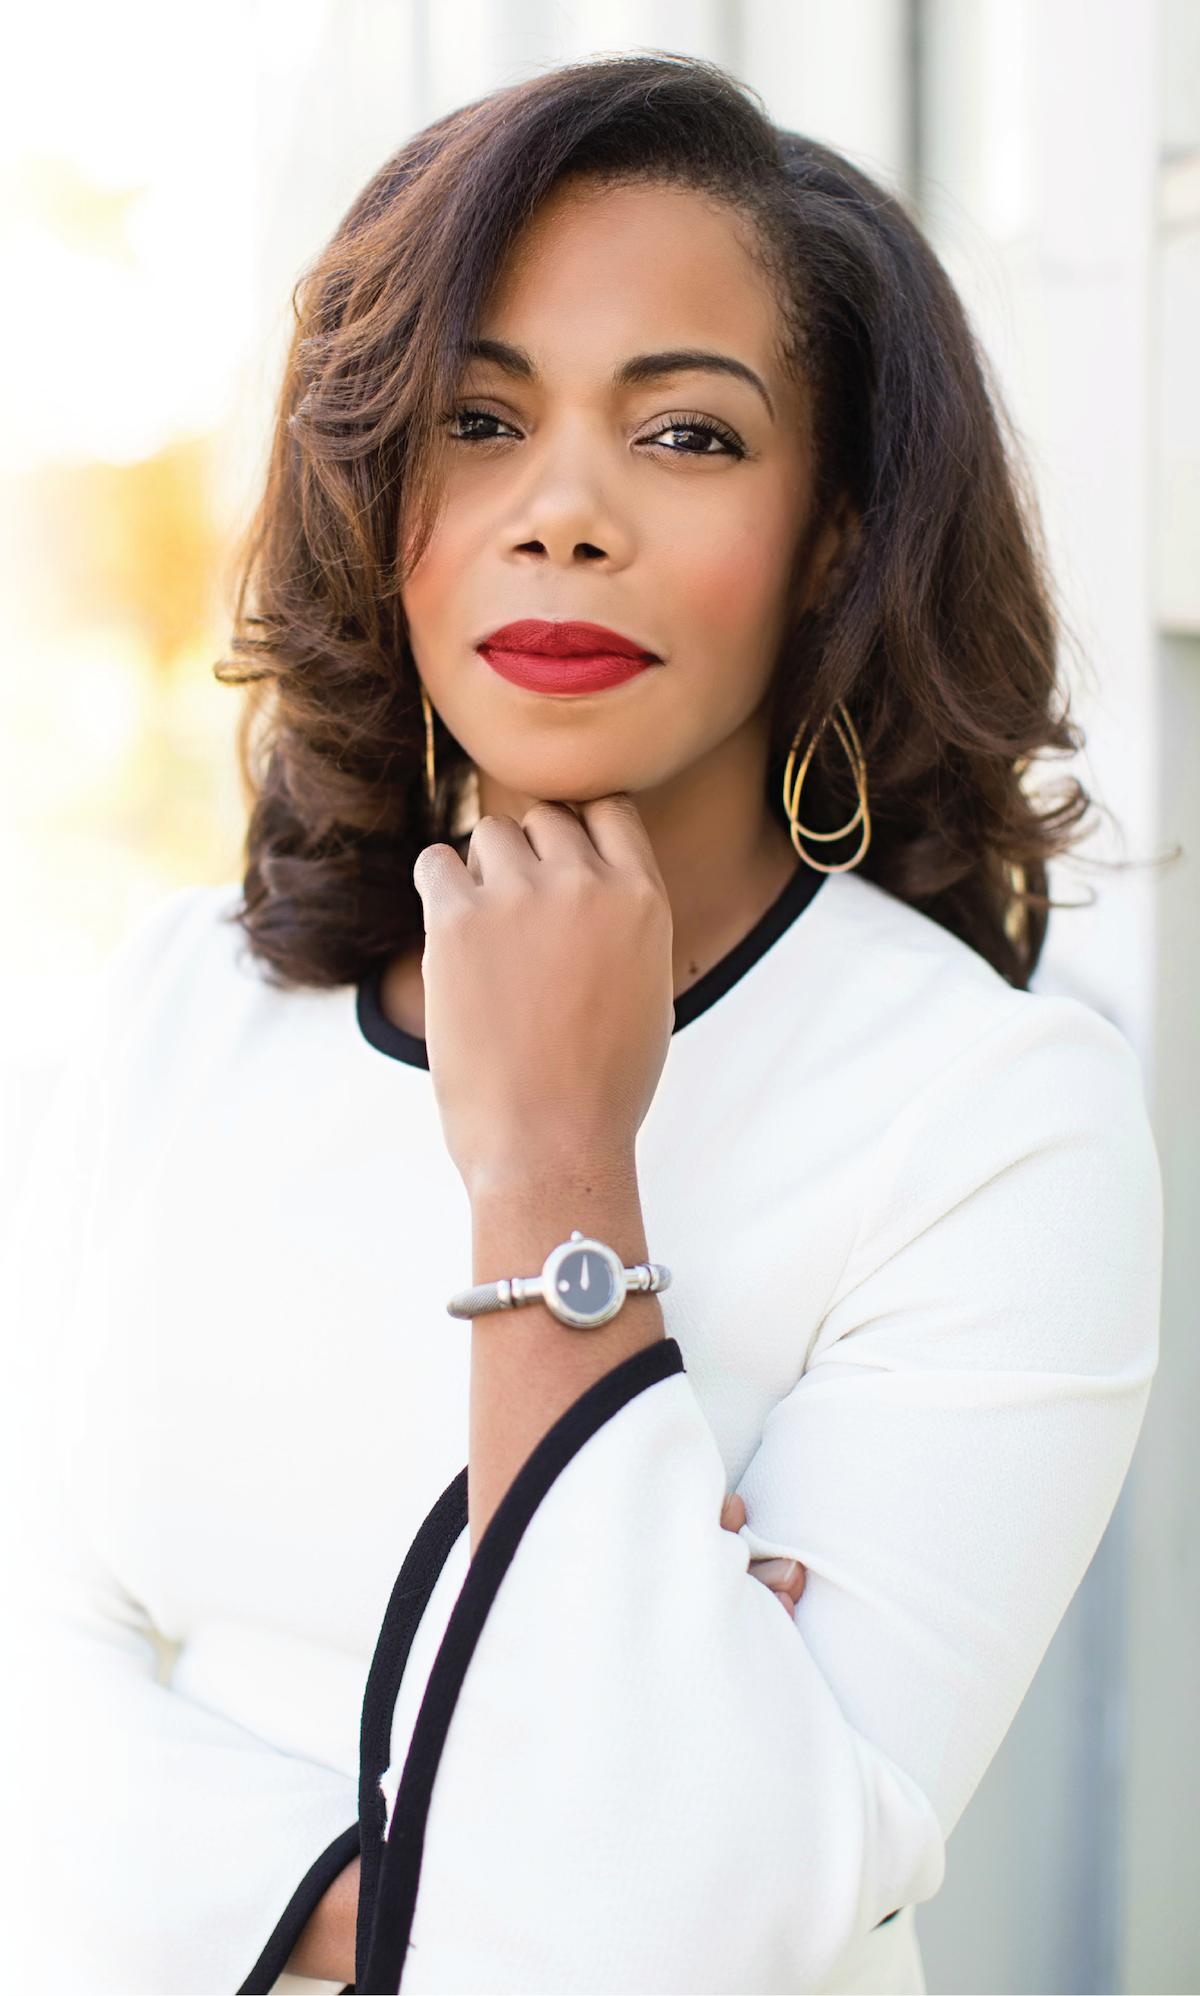 Erica C Crawley, Willoughby Avenue, The Five Fifths, KOLUMN Magazine, KOLUMN, African American Politics, Blacks in Politics, Black Vote, Vote Black